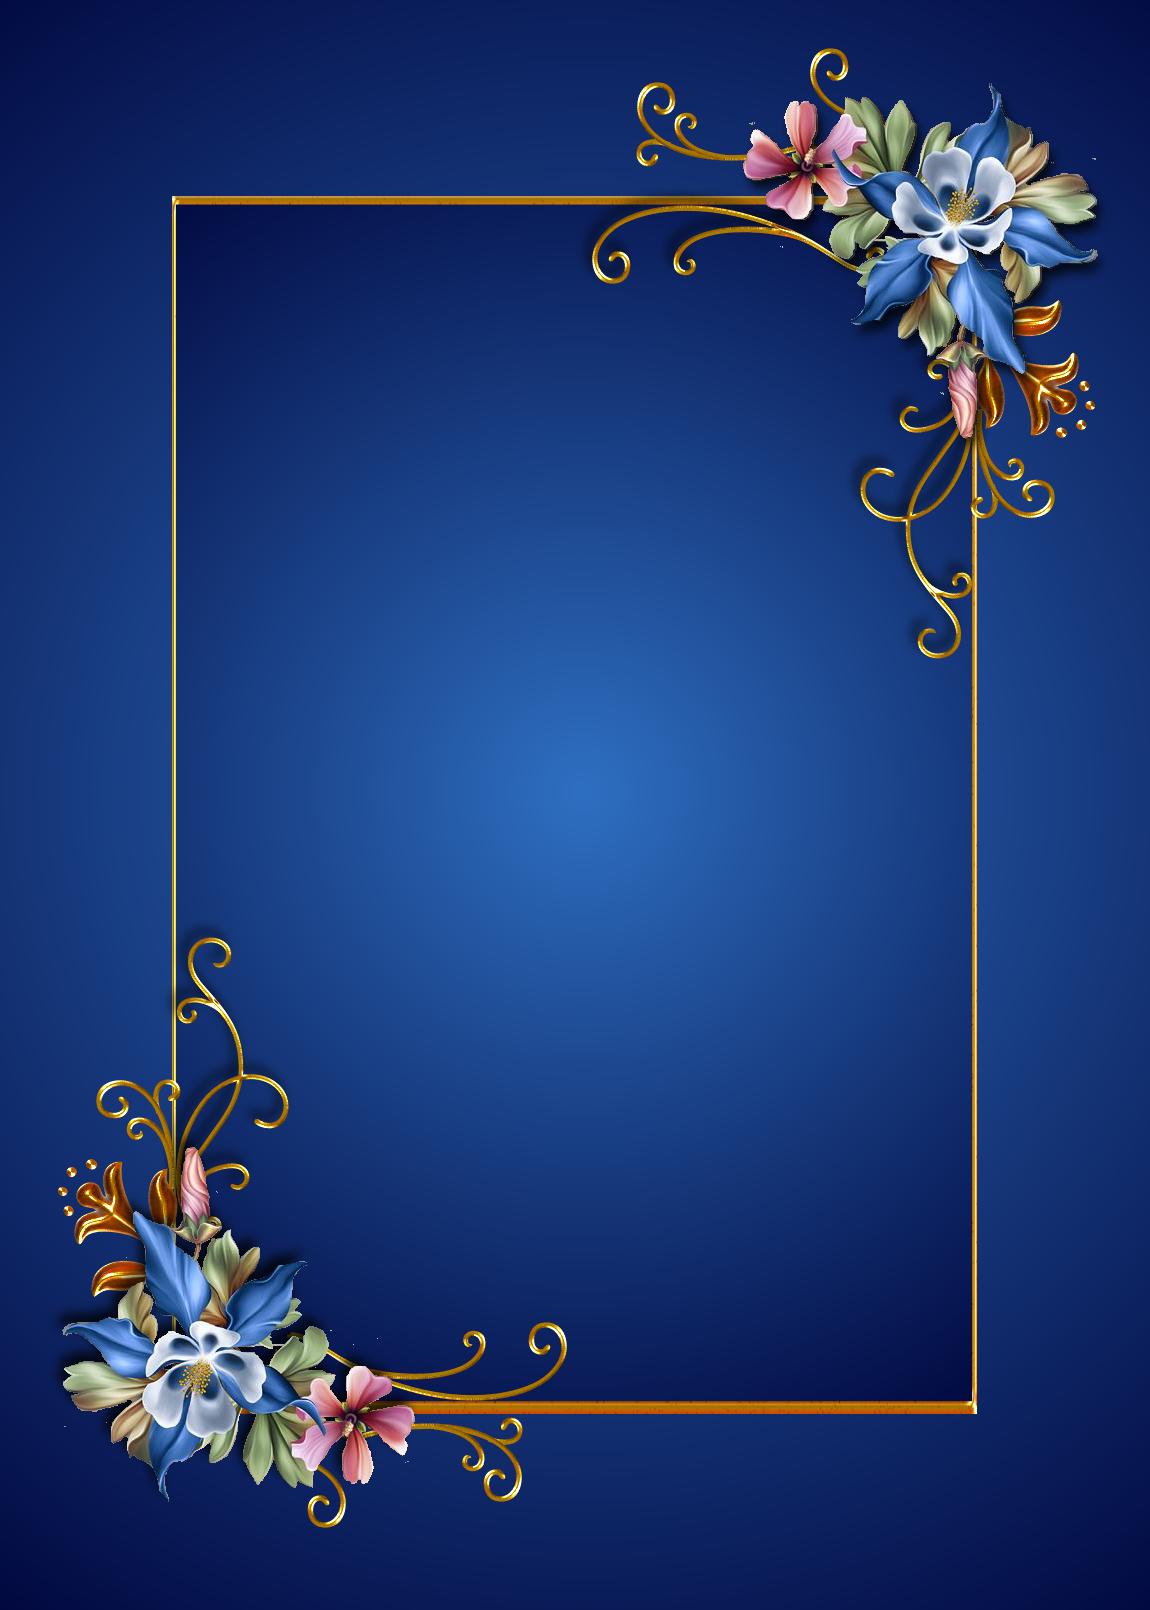 blue floral on blue | Digital art! | Pinterest | Rahmen, Briefpapier ...